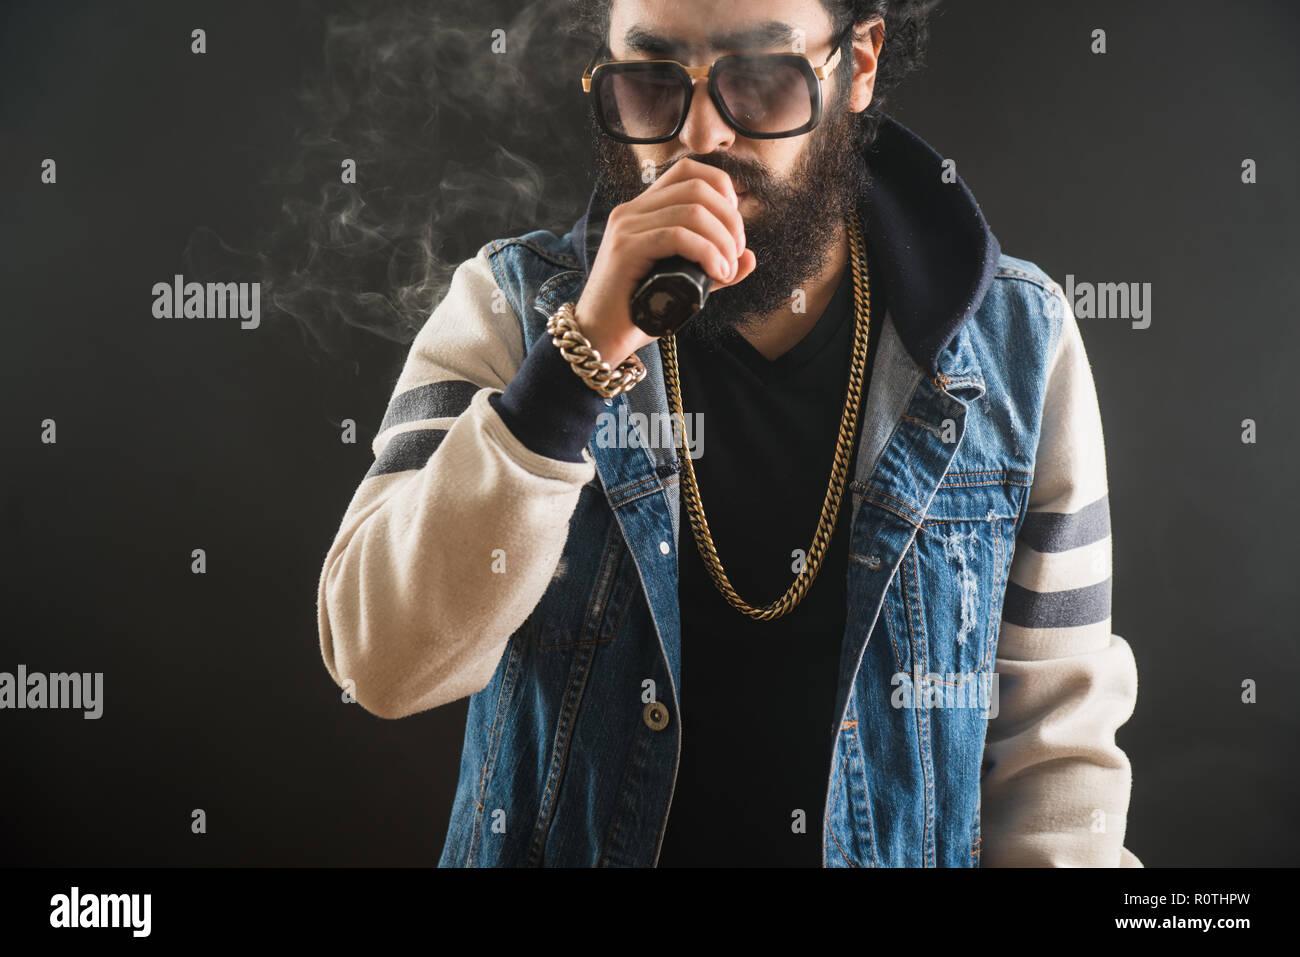 Young man with beard and sunglasses vaping an electronic cigarette. Vaper hipster smoke vaporizer - Stock Image